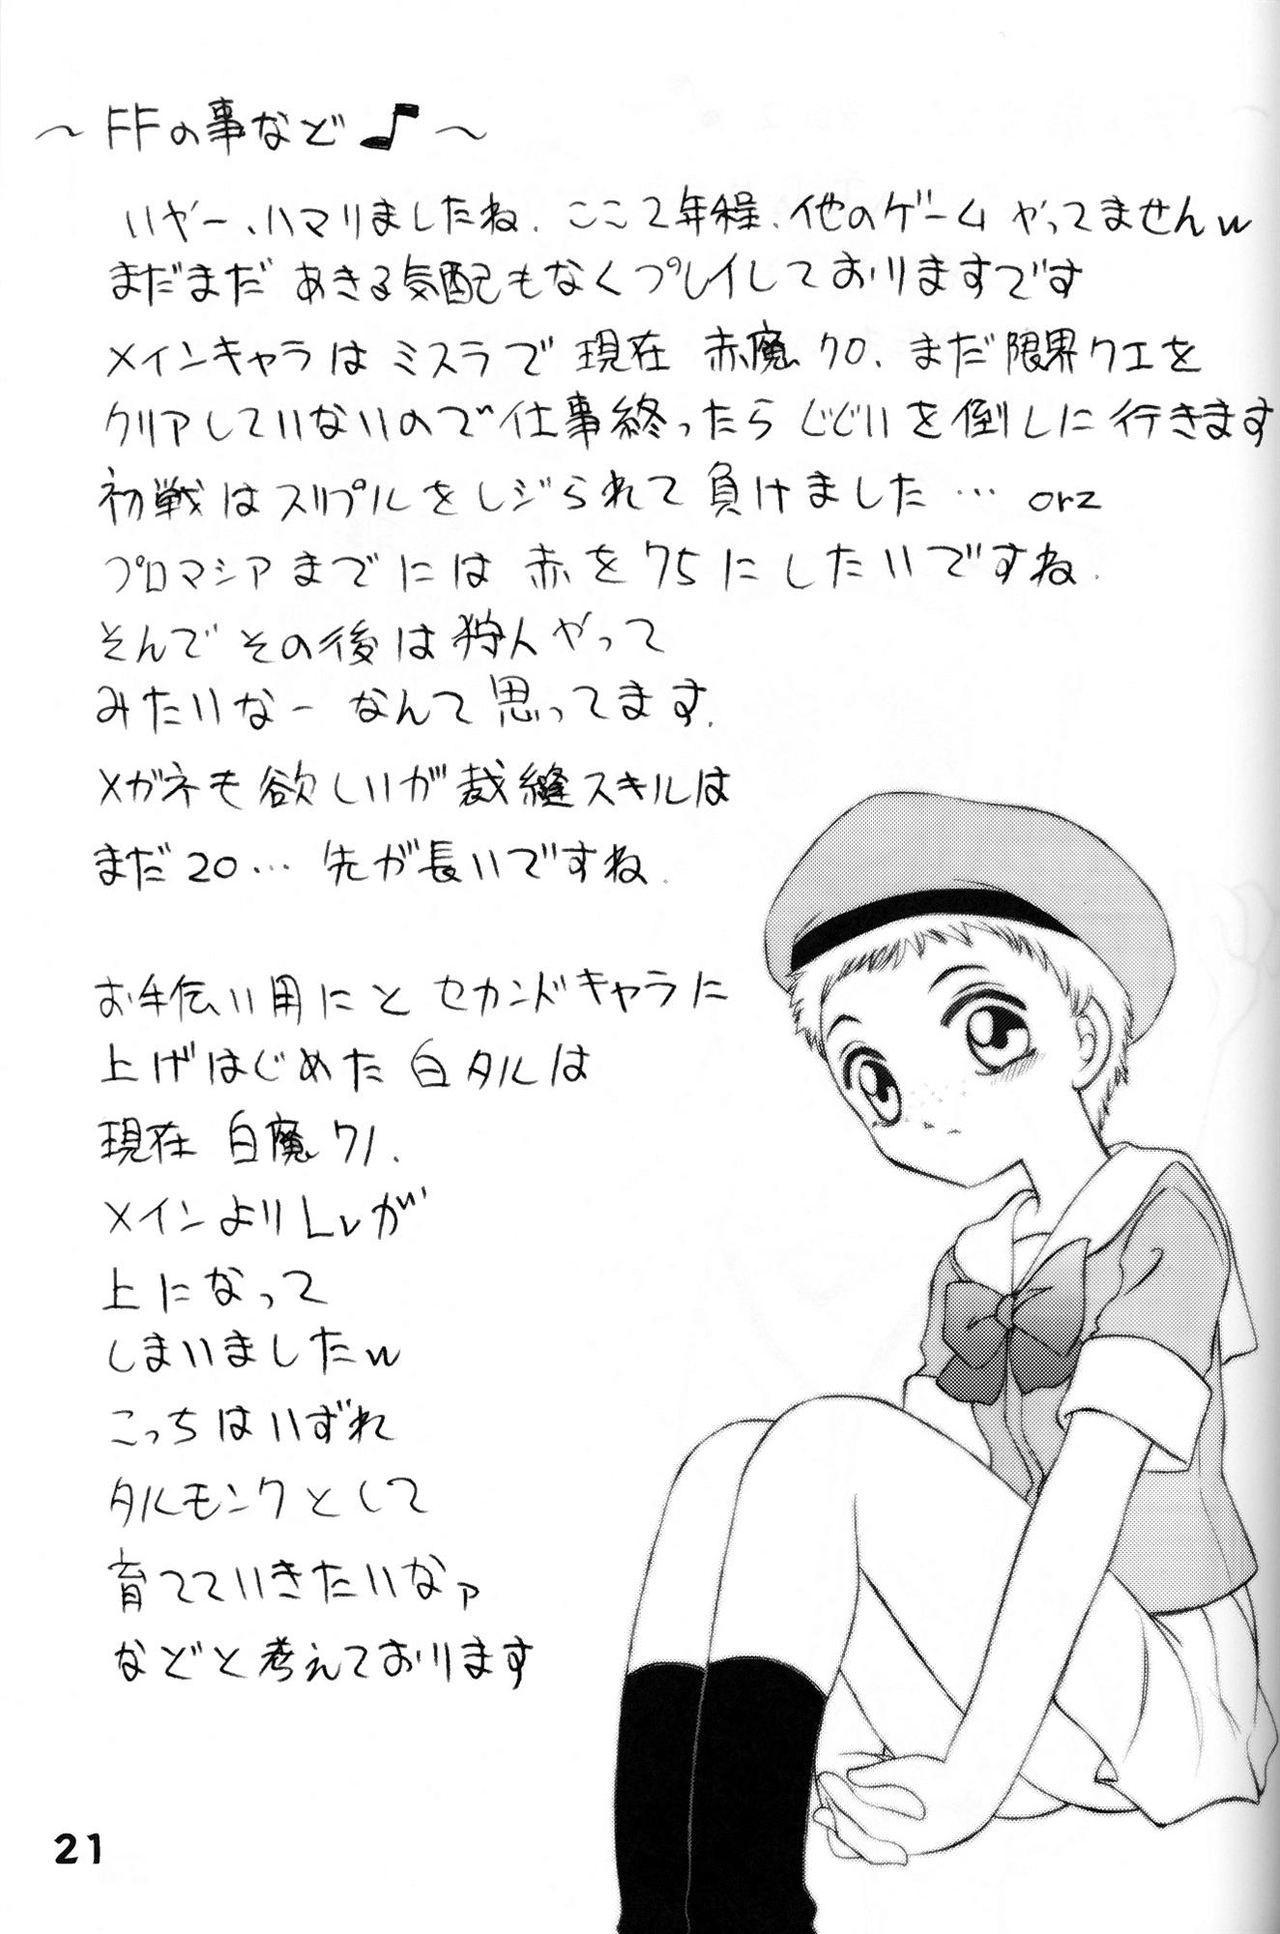 Shitteru Kuse ni! Vol. 33 19